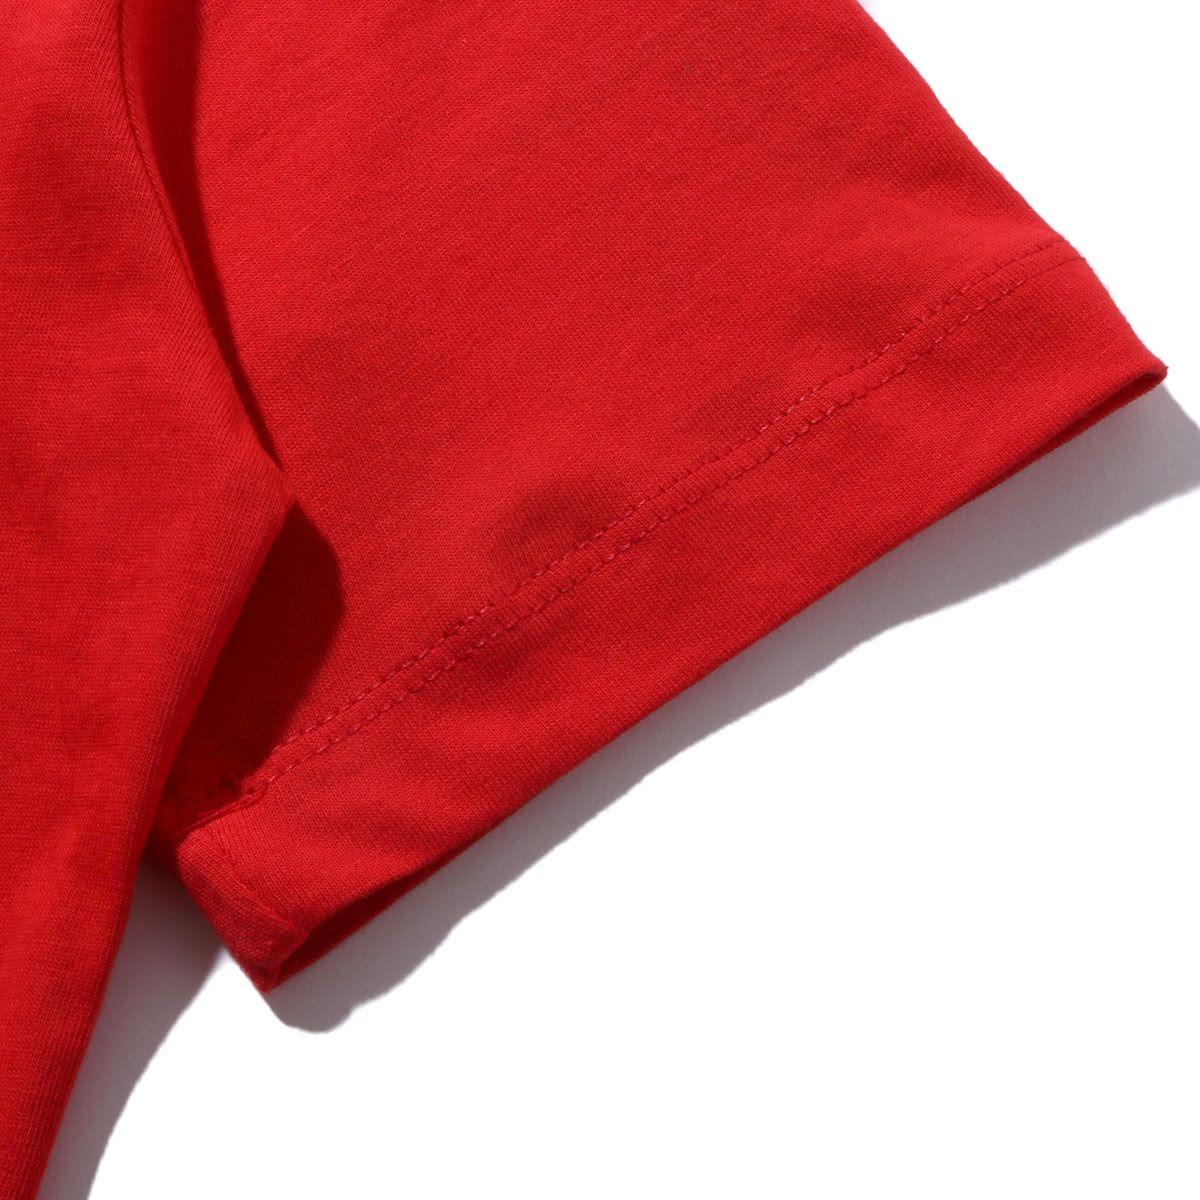 d3edbce3b2f NIKEBNSWTEEFUTURAICONTD(ナイキYTHフューチュラアイコンTDTシャツ)UNIVERSITYRED WHITE キッズTシャツ